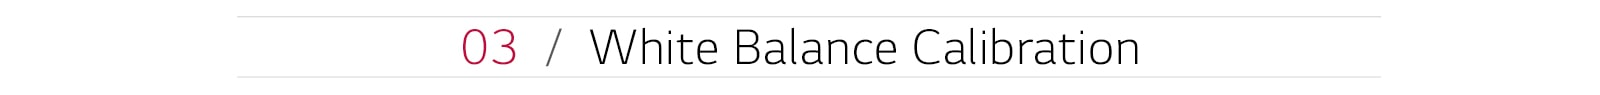 LG SuperSign White Balance